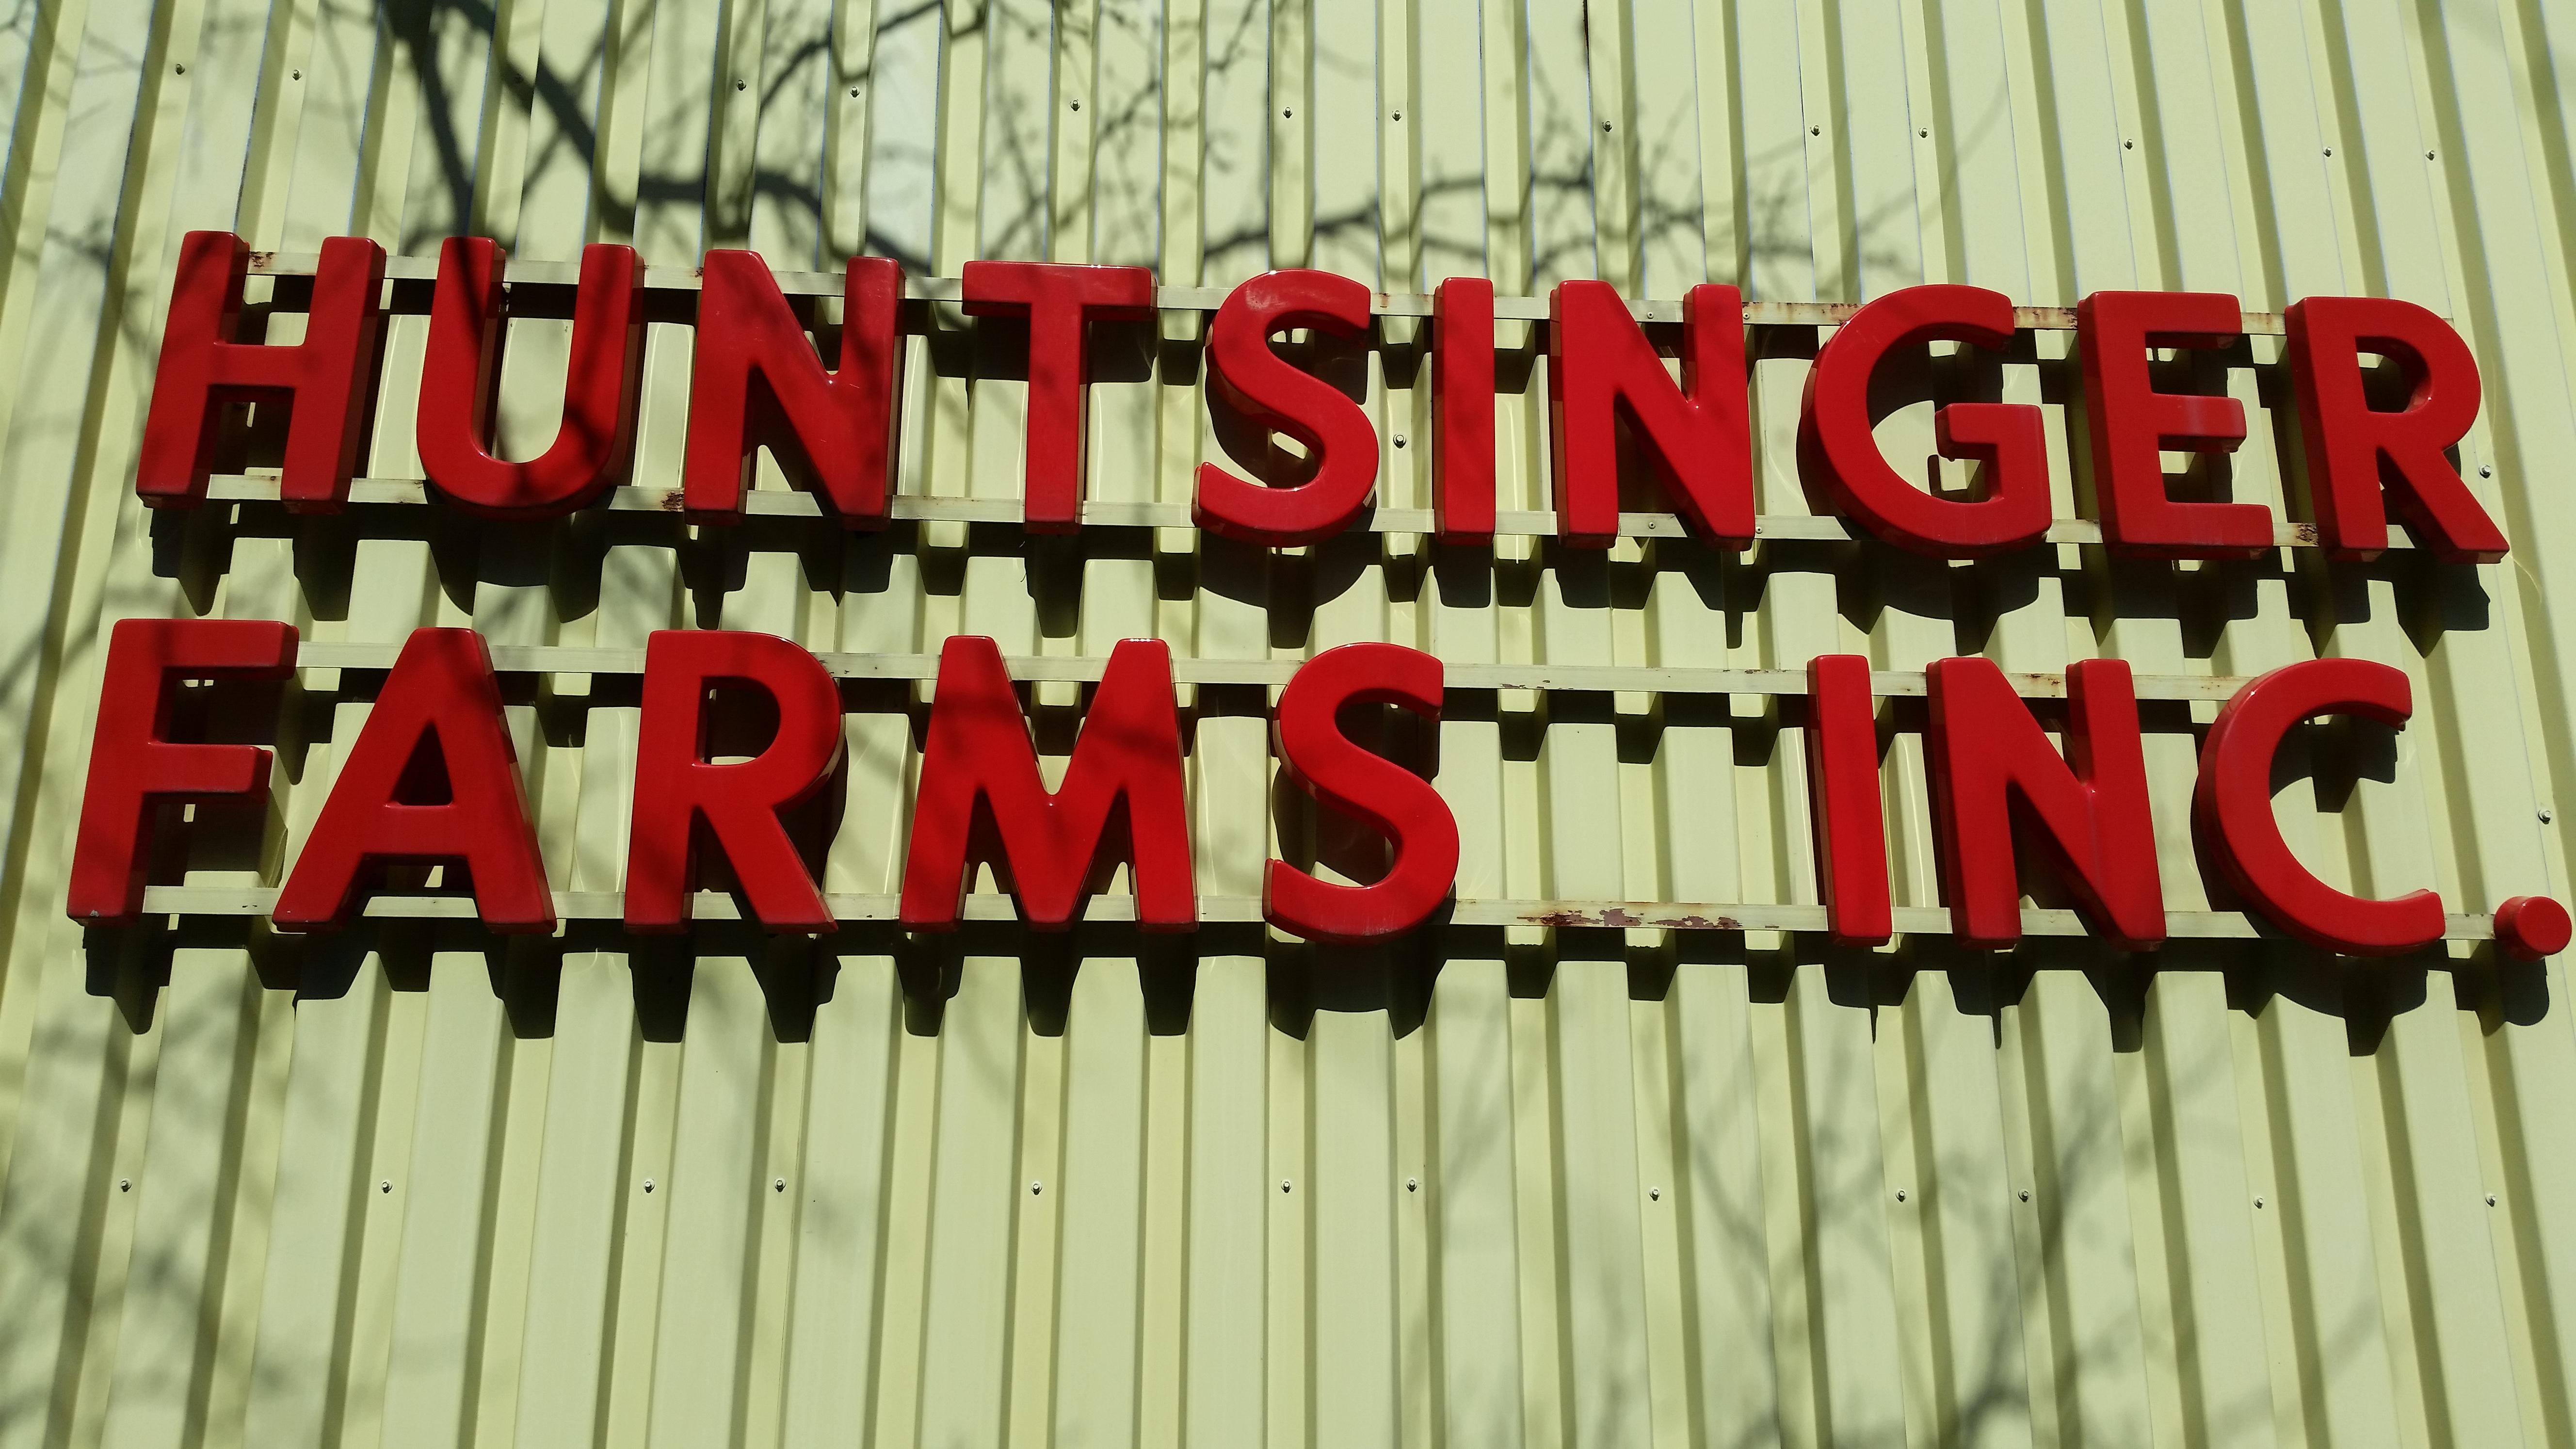 Huntsinger Farms, Inc.